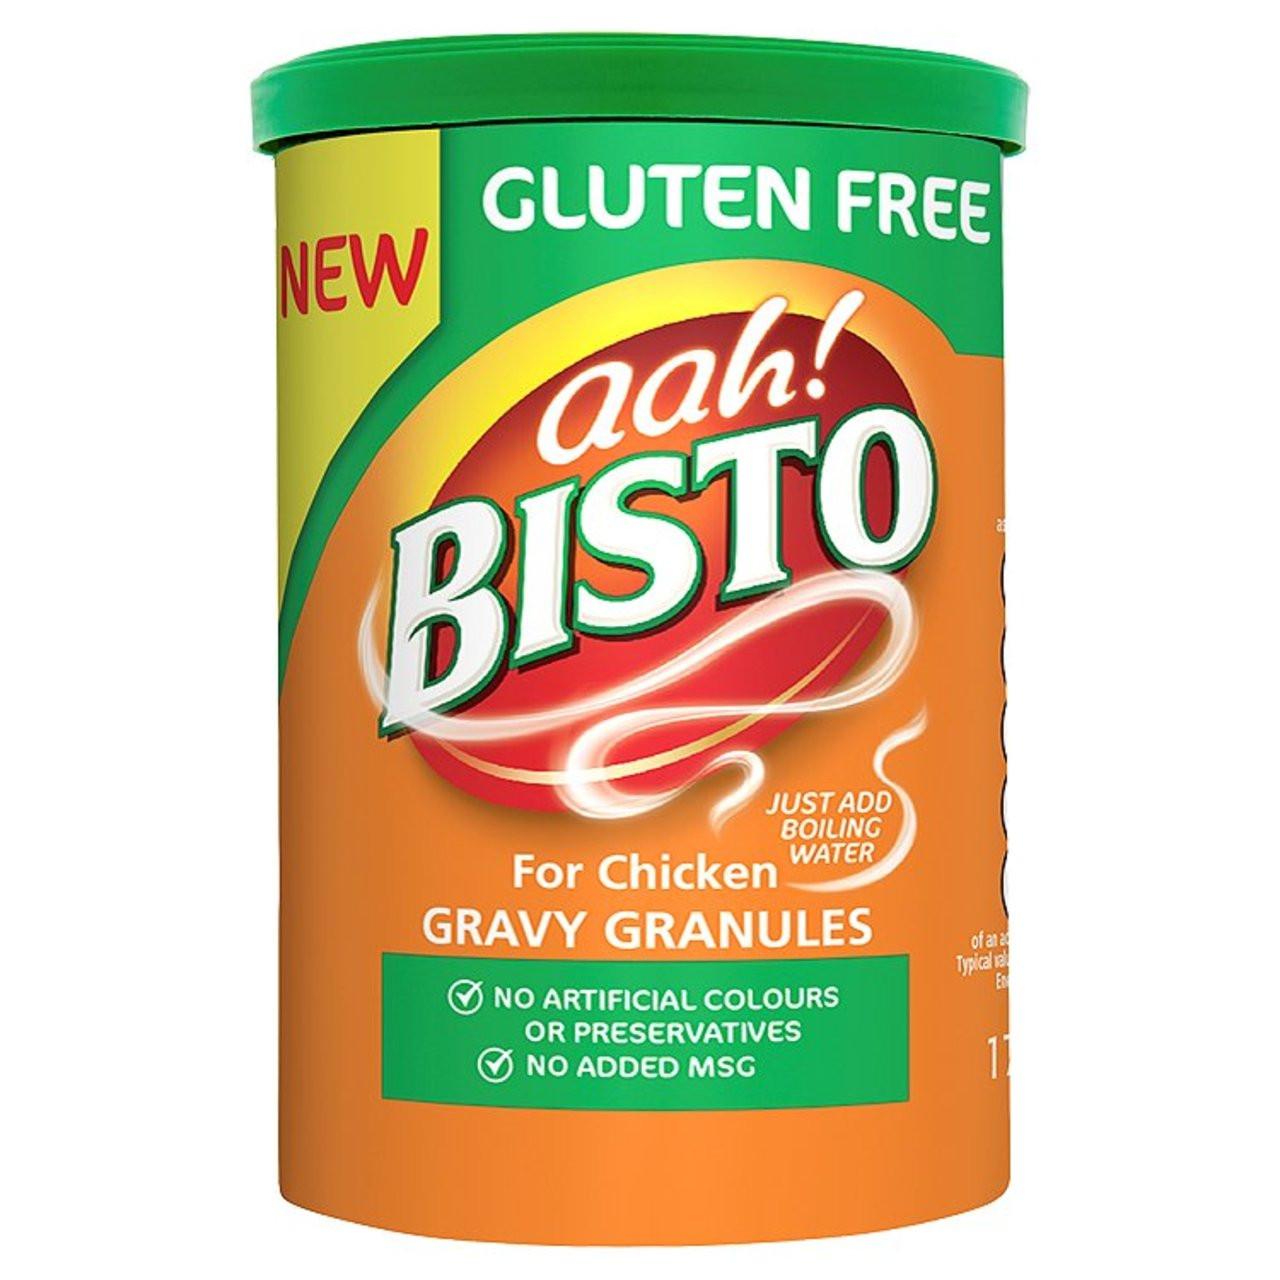 are bisto gravy granules gluten free